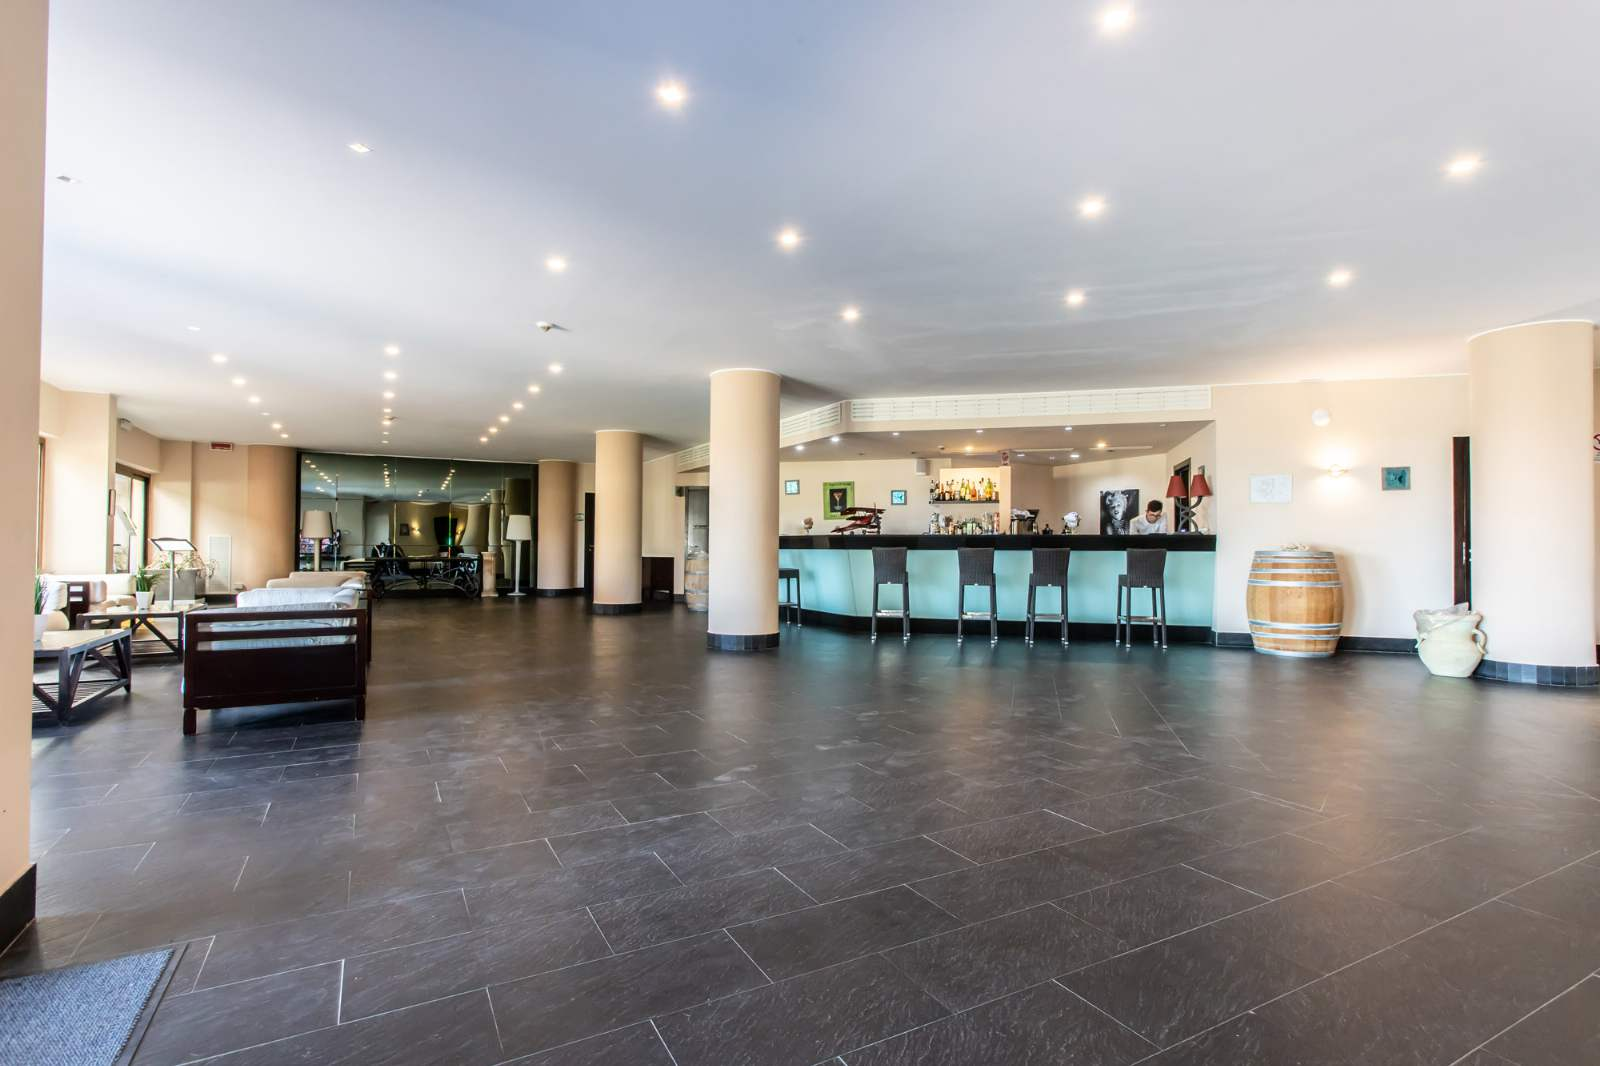 Falconara Resort & Spa: room / property / locale photo. Image 9